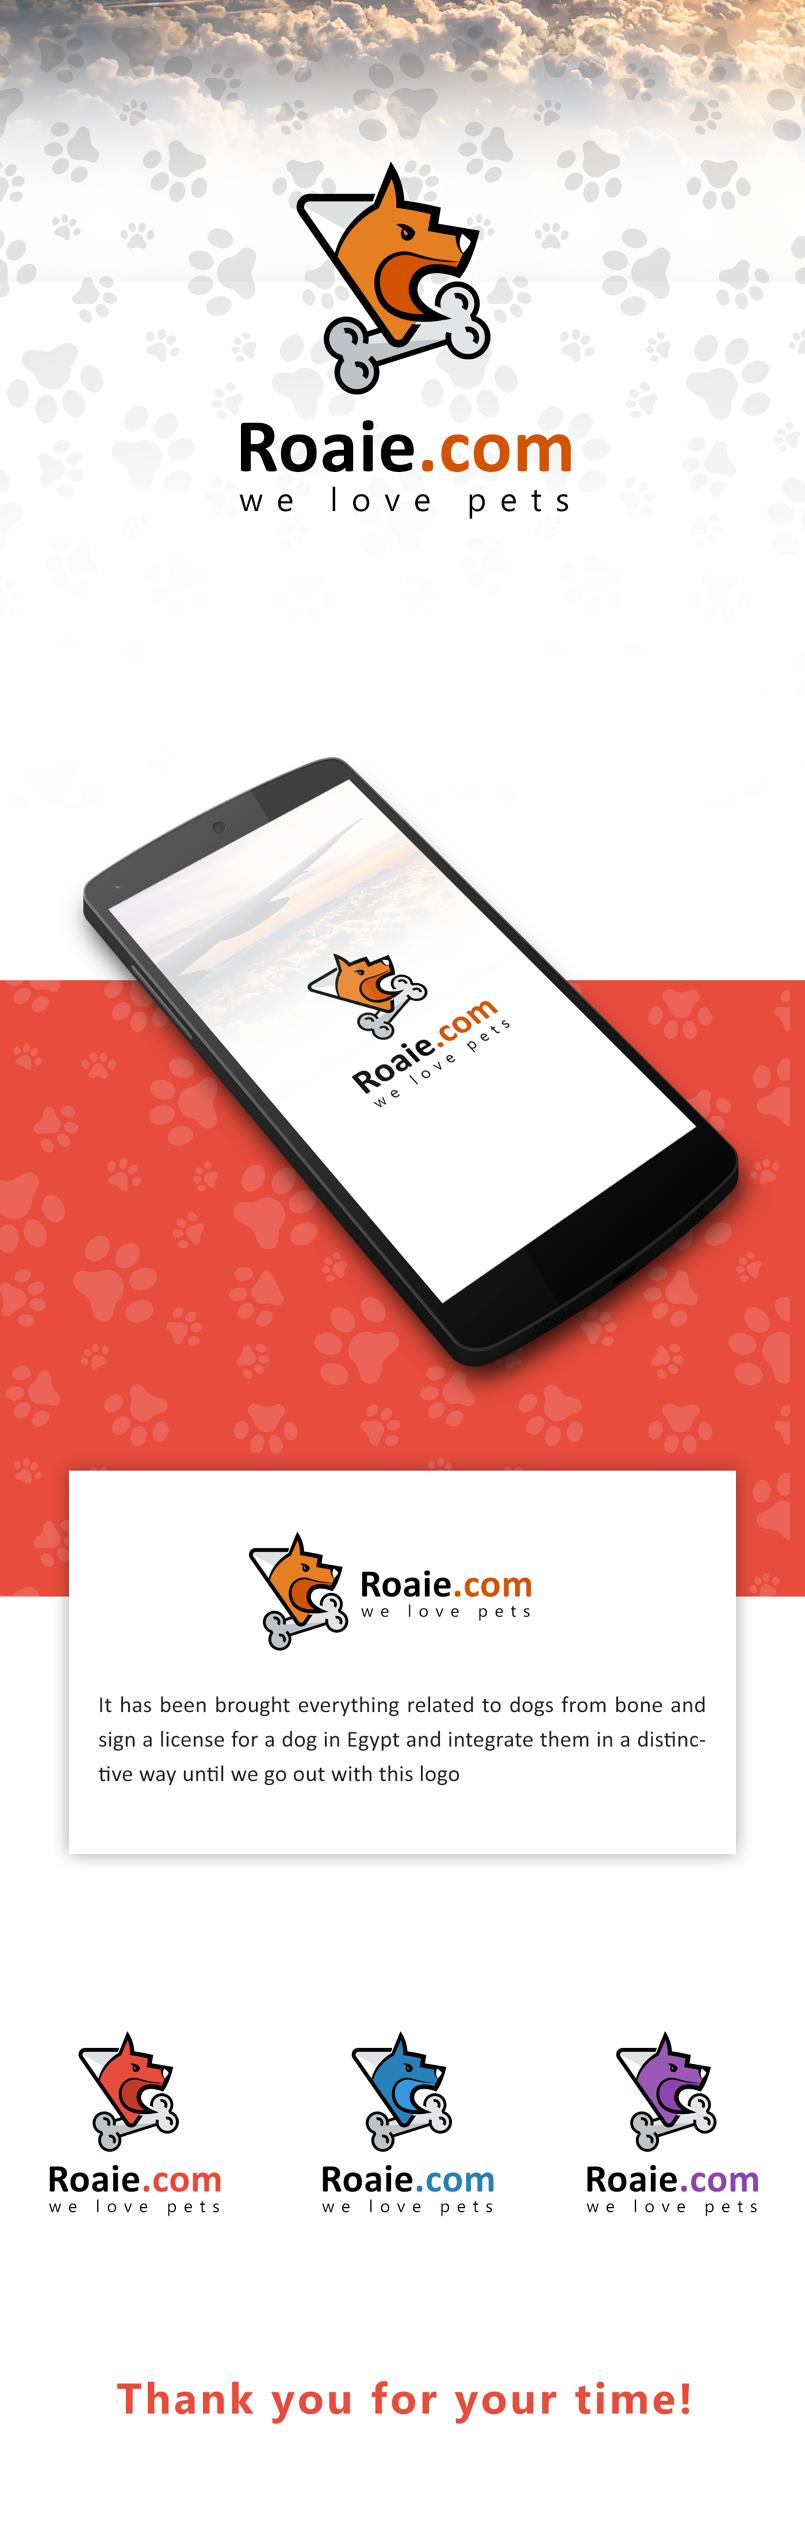 Roaie logo